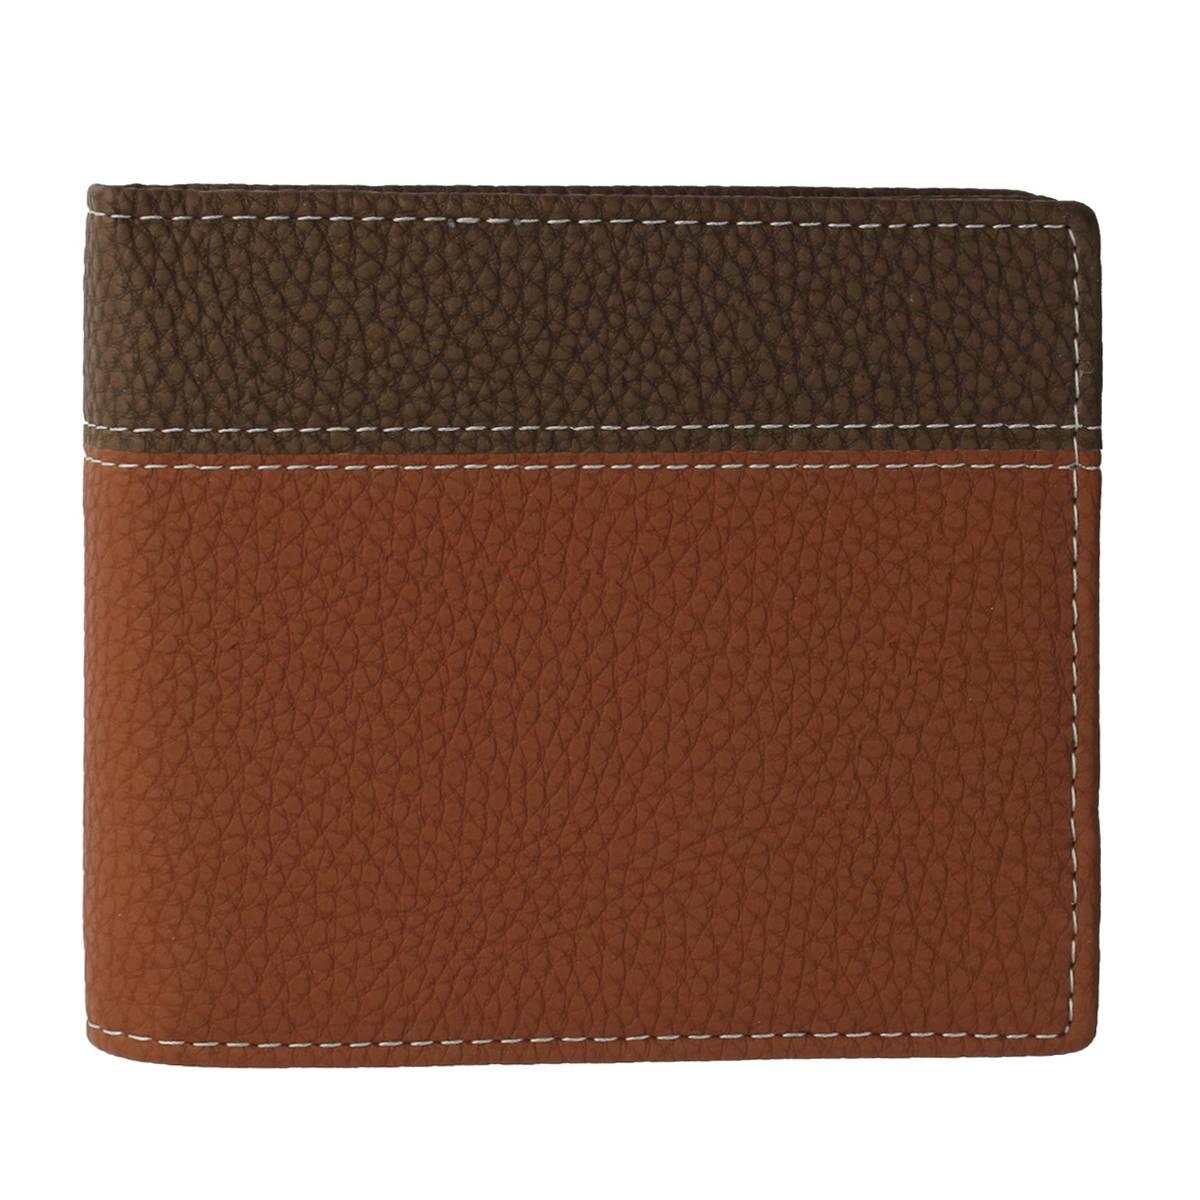 Men's Textured Leather Wallet Men Bags & Wallets Wallets